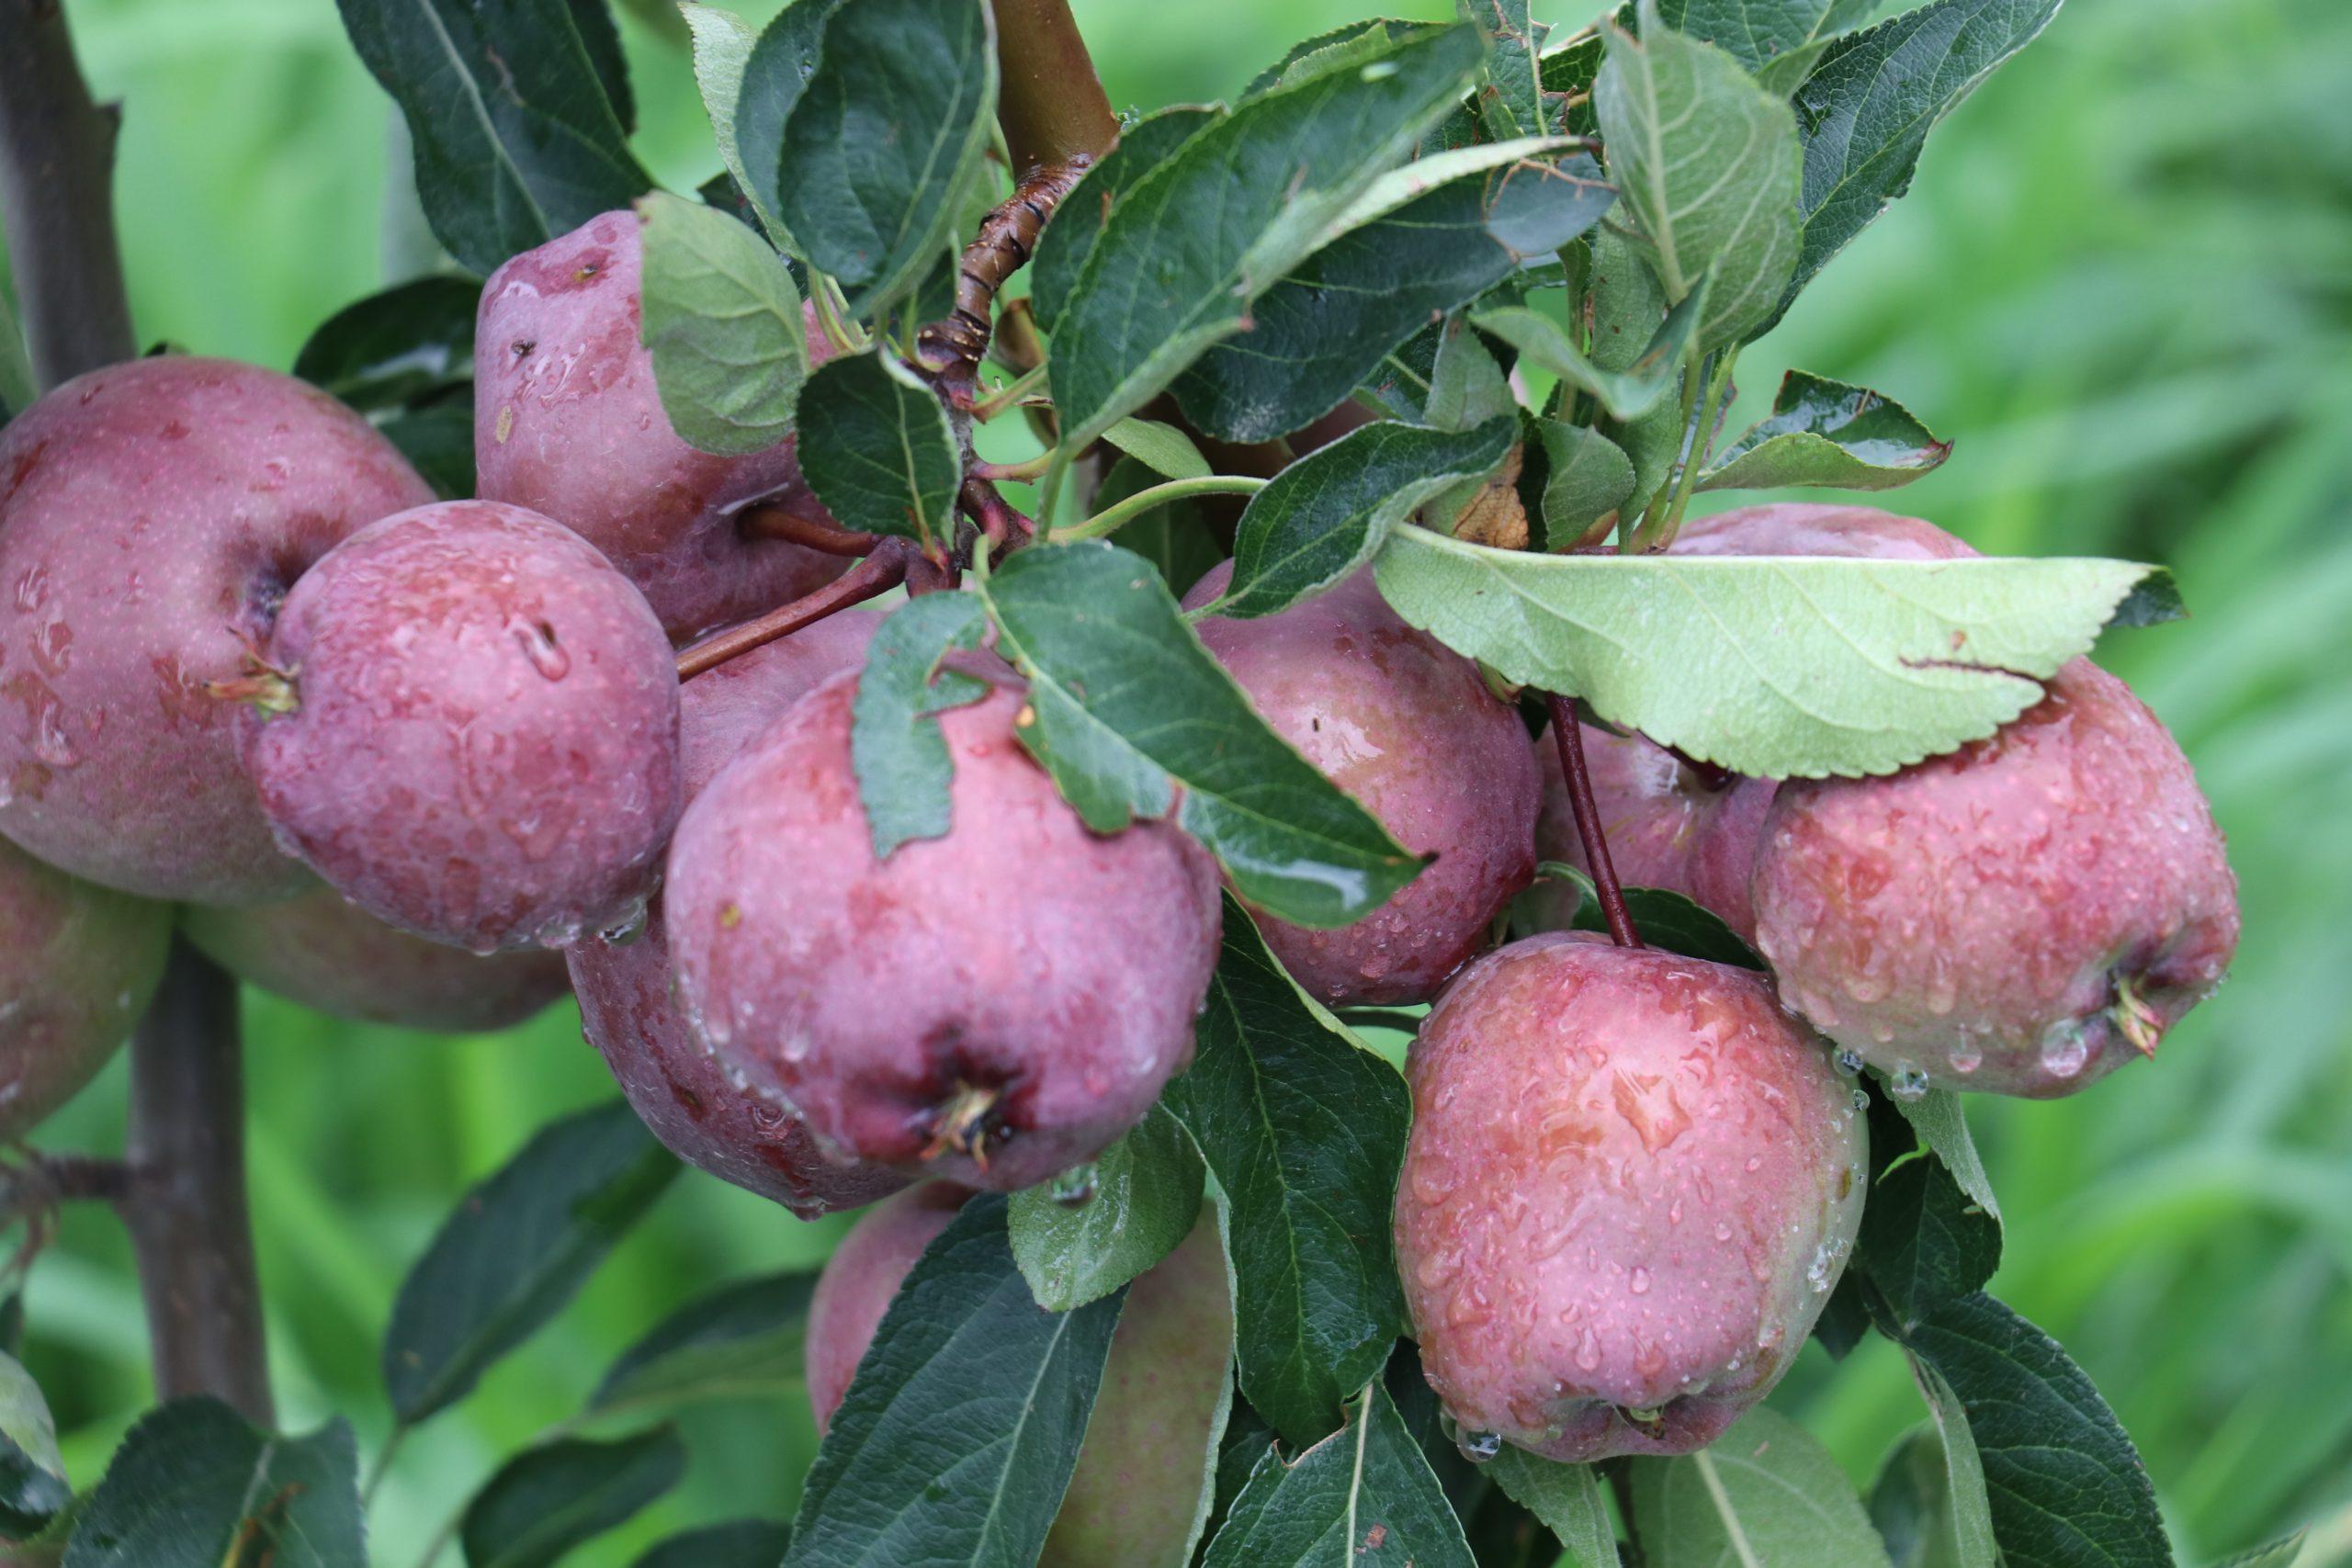 Fresh apples on a tree